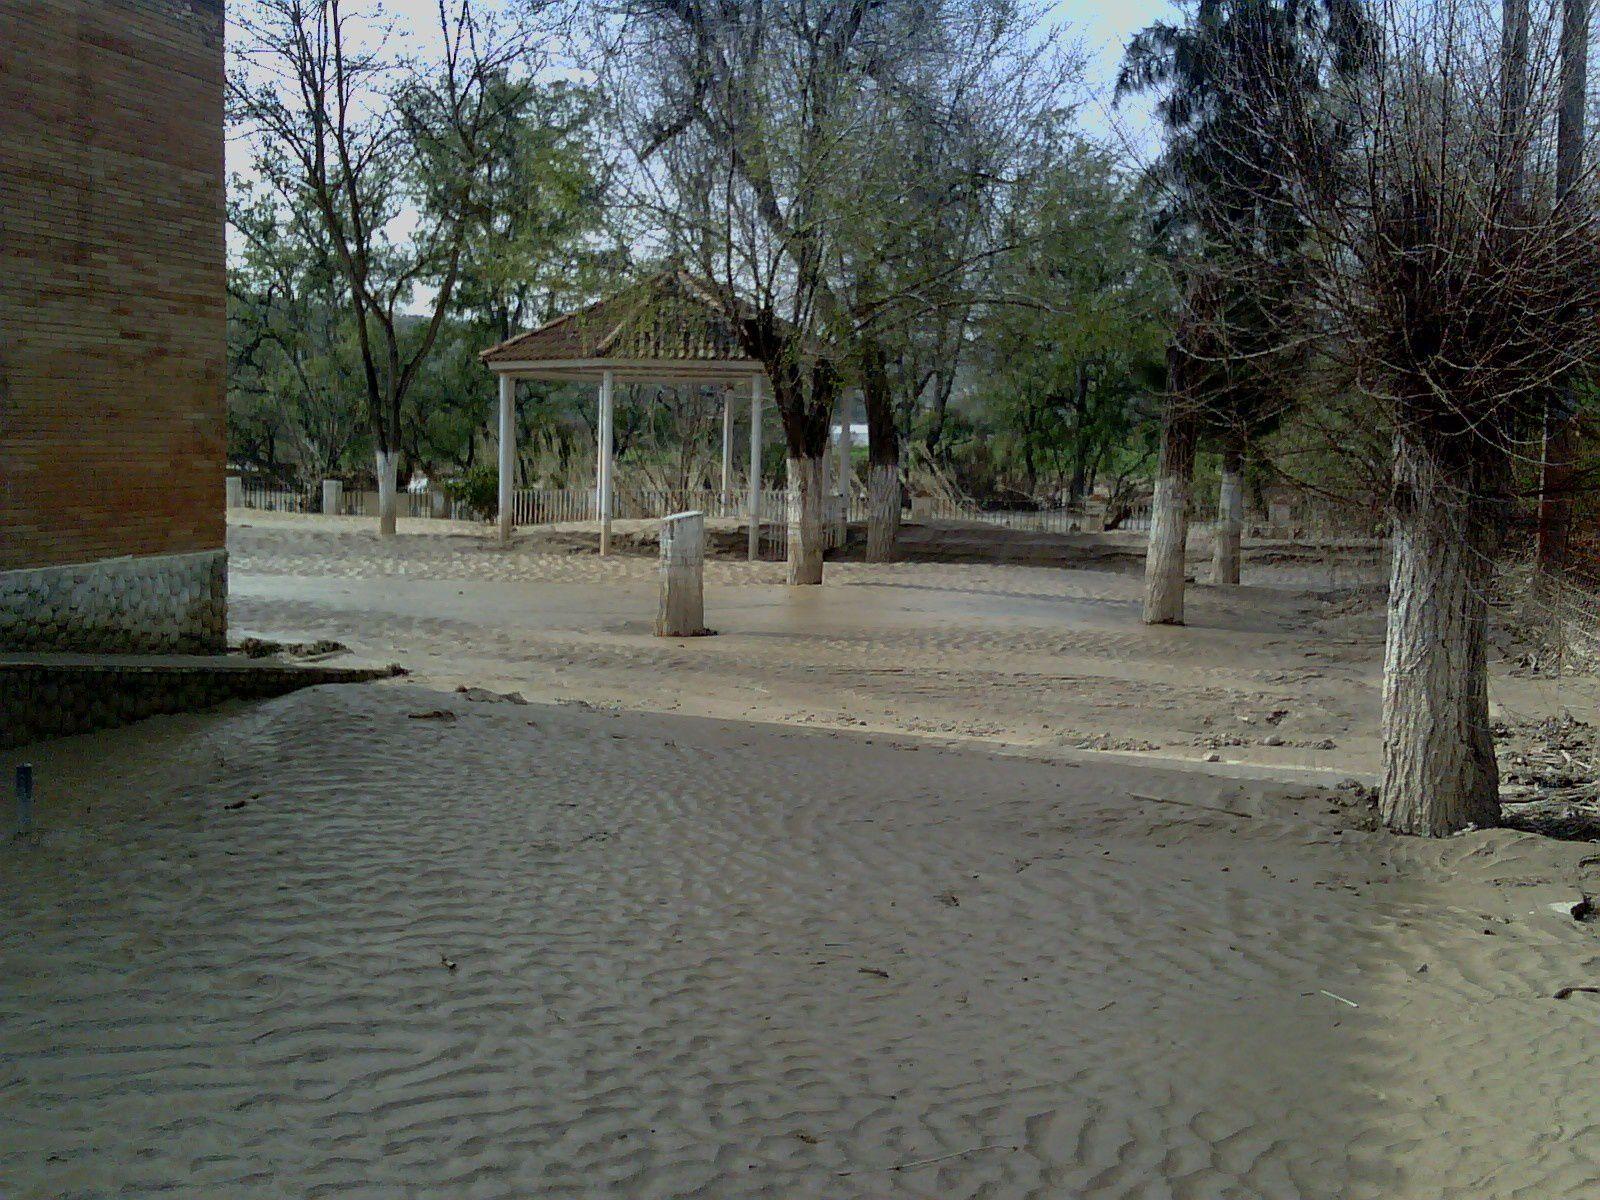 Badolatosa 19-03-2010